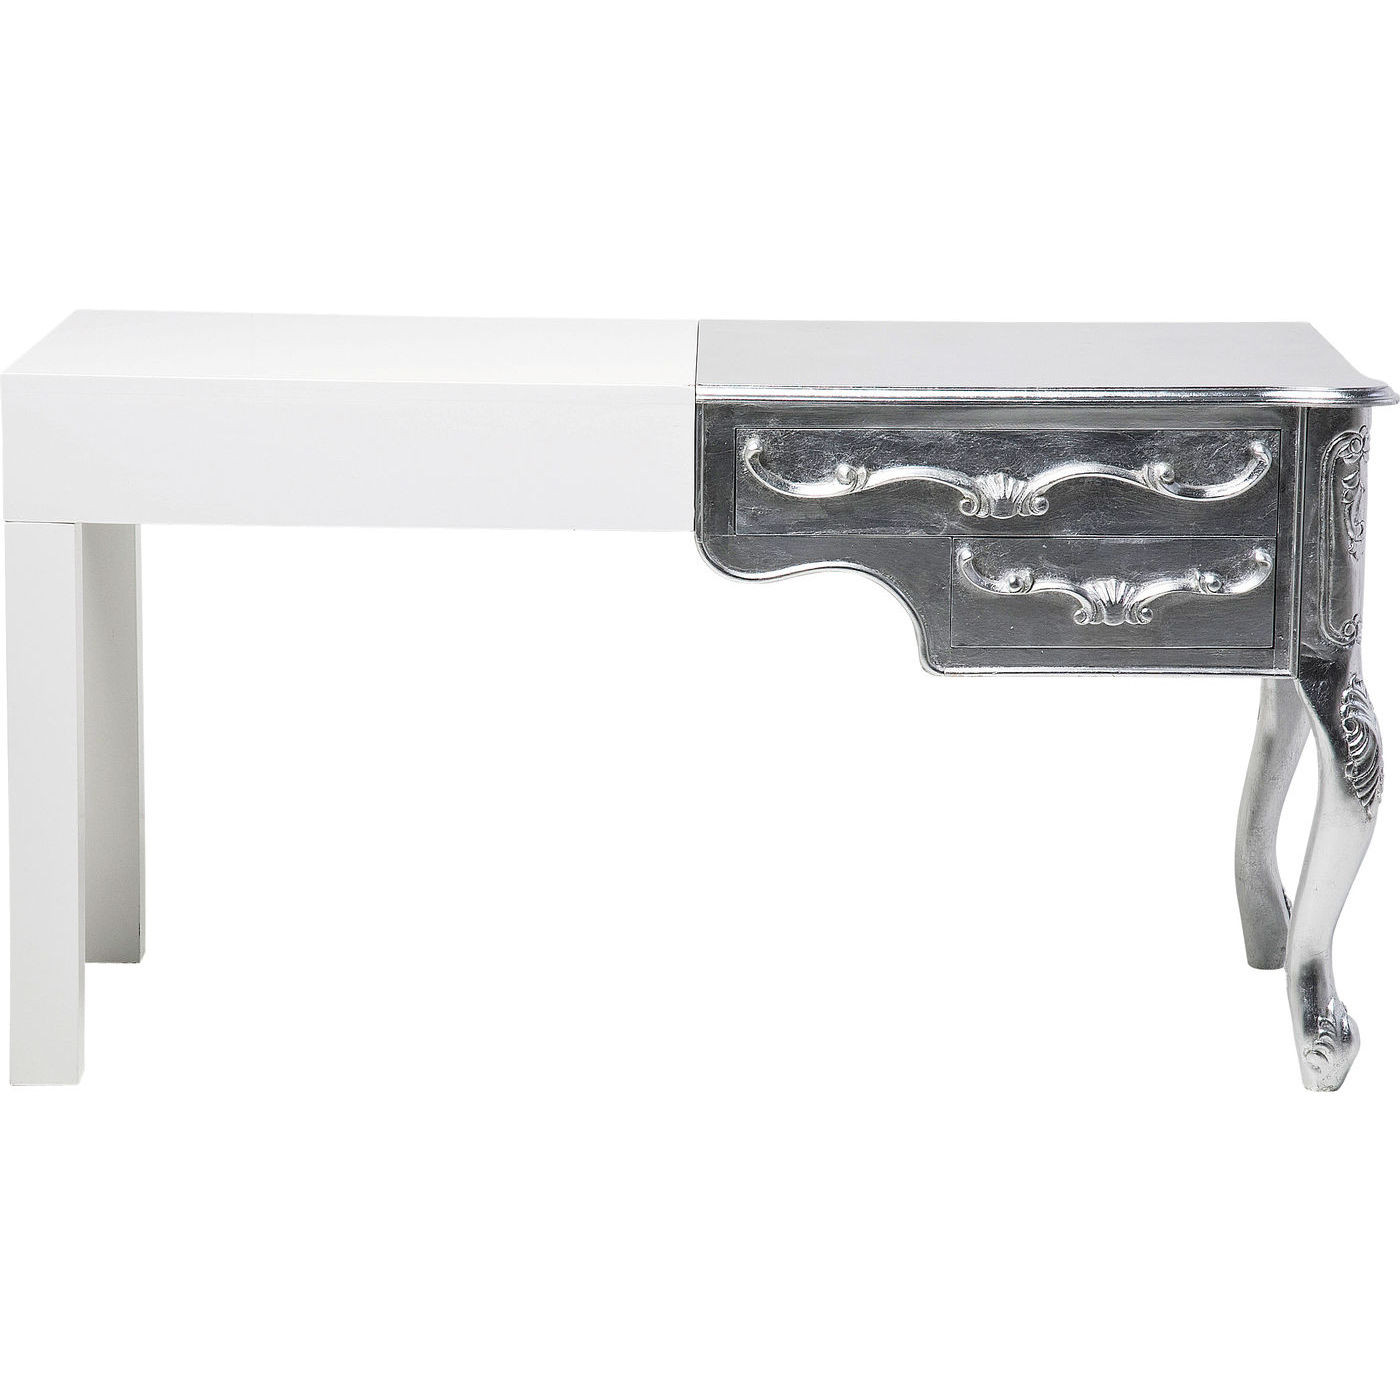 schreibtisch janus 140x60cm 2sk kare design mutoni m bel. Black Bedroom Furniture Sets. Home Design Ideas